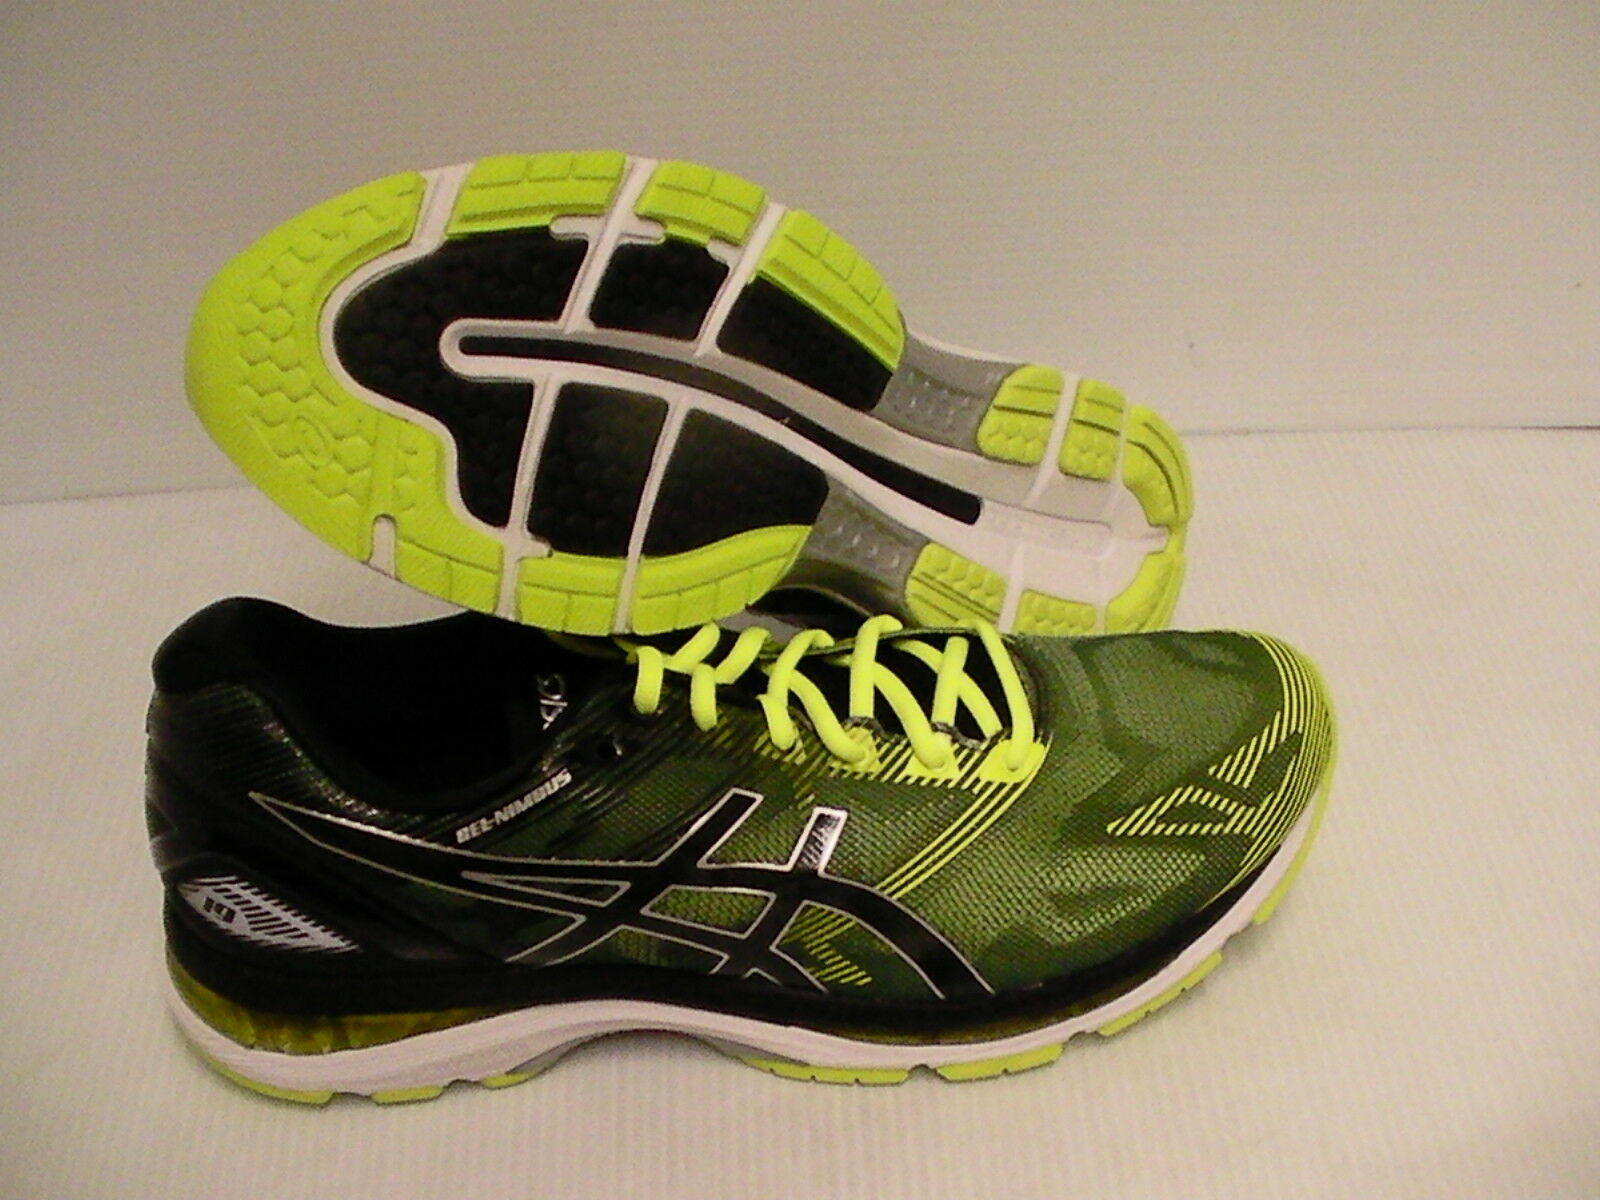 Asics men's gel nimbus 19 running shoes black safety yellow silver size 8 us